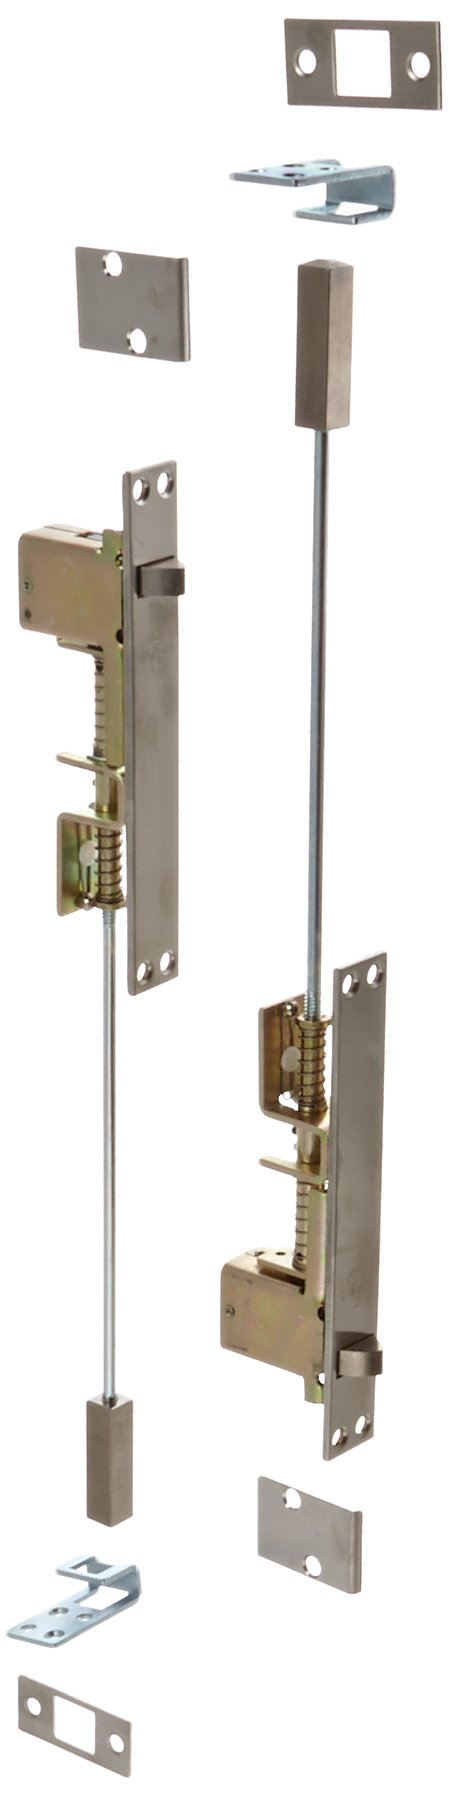 Rockwood 2842.32D Stainless Steel Automatic Flush Bolt Set For Metal Doors, 1'' Width x 6-3/4'' Length, Satin Finish